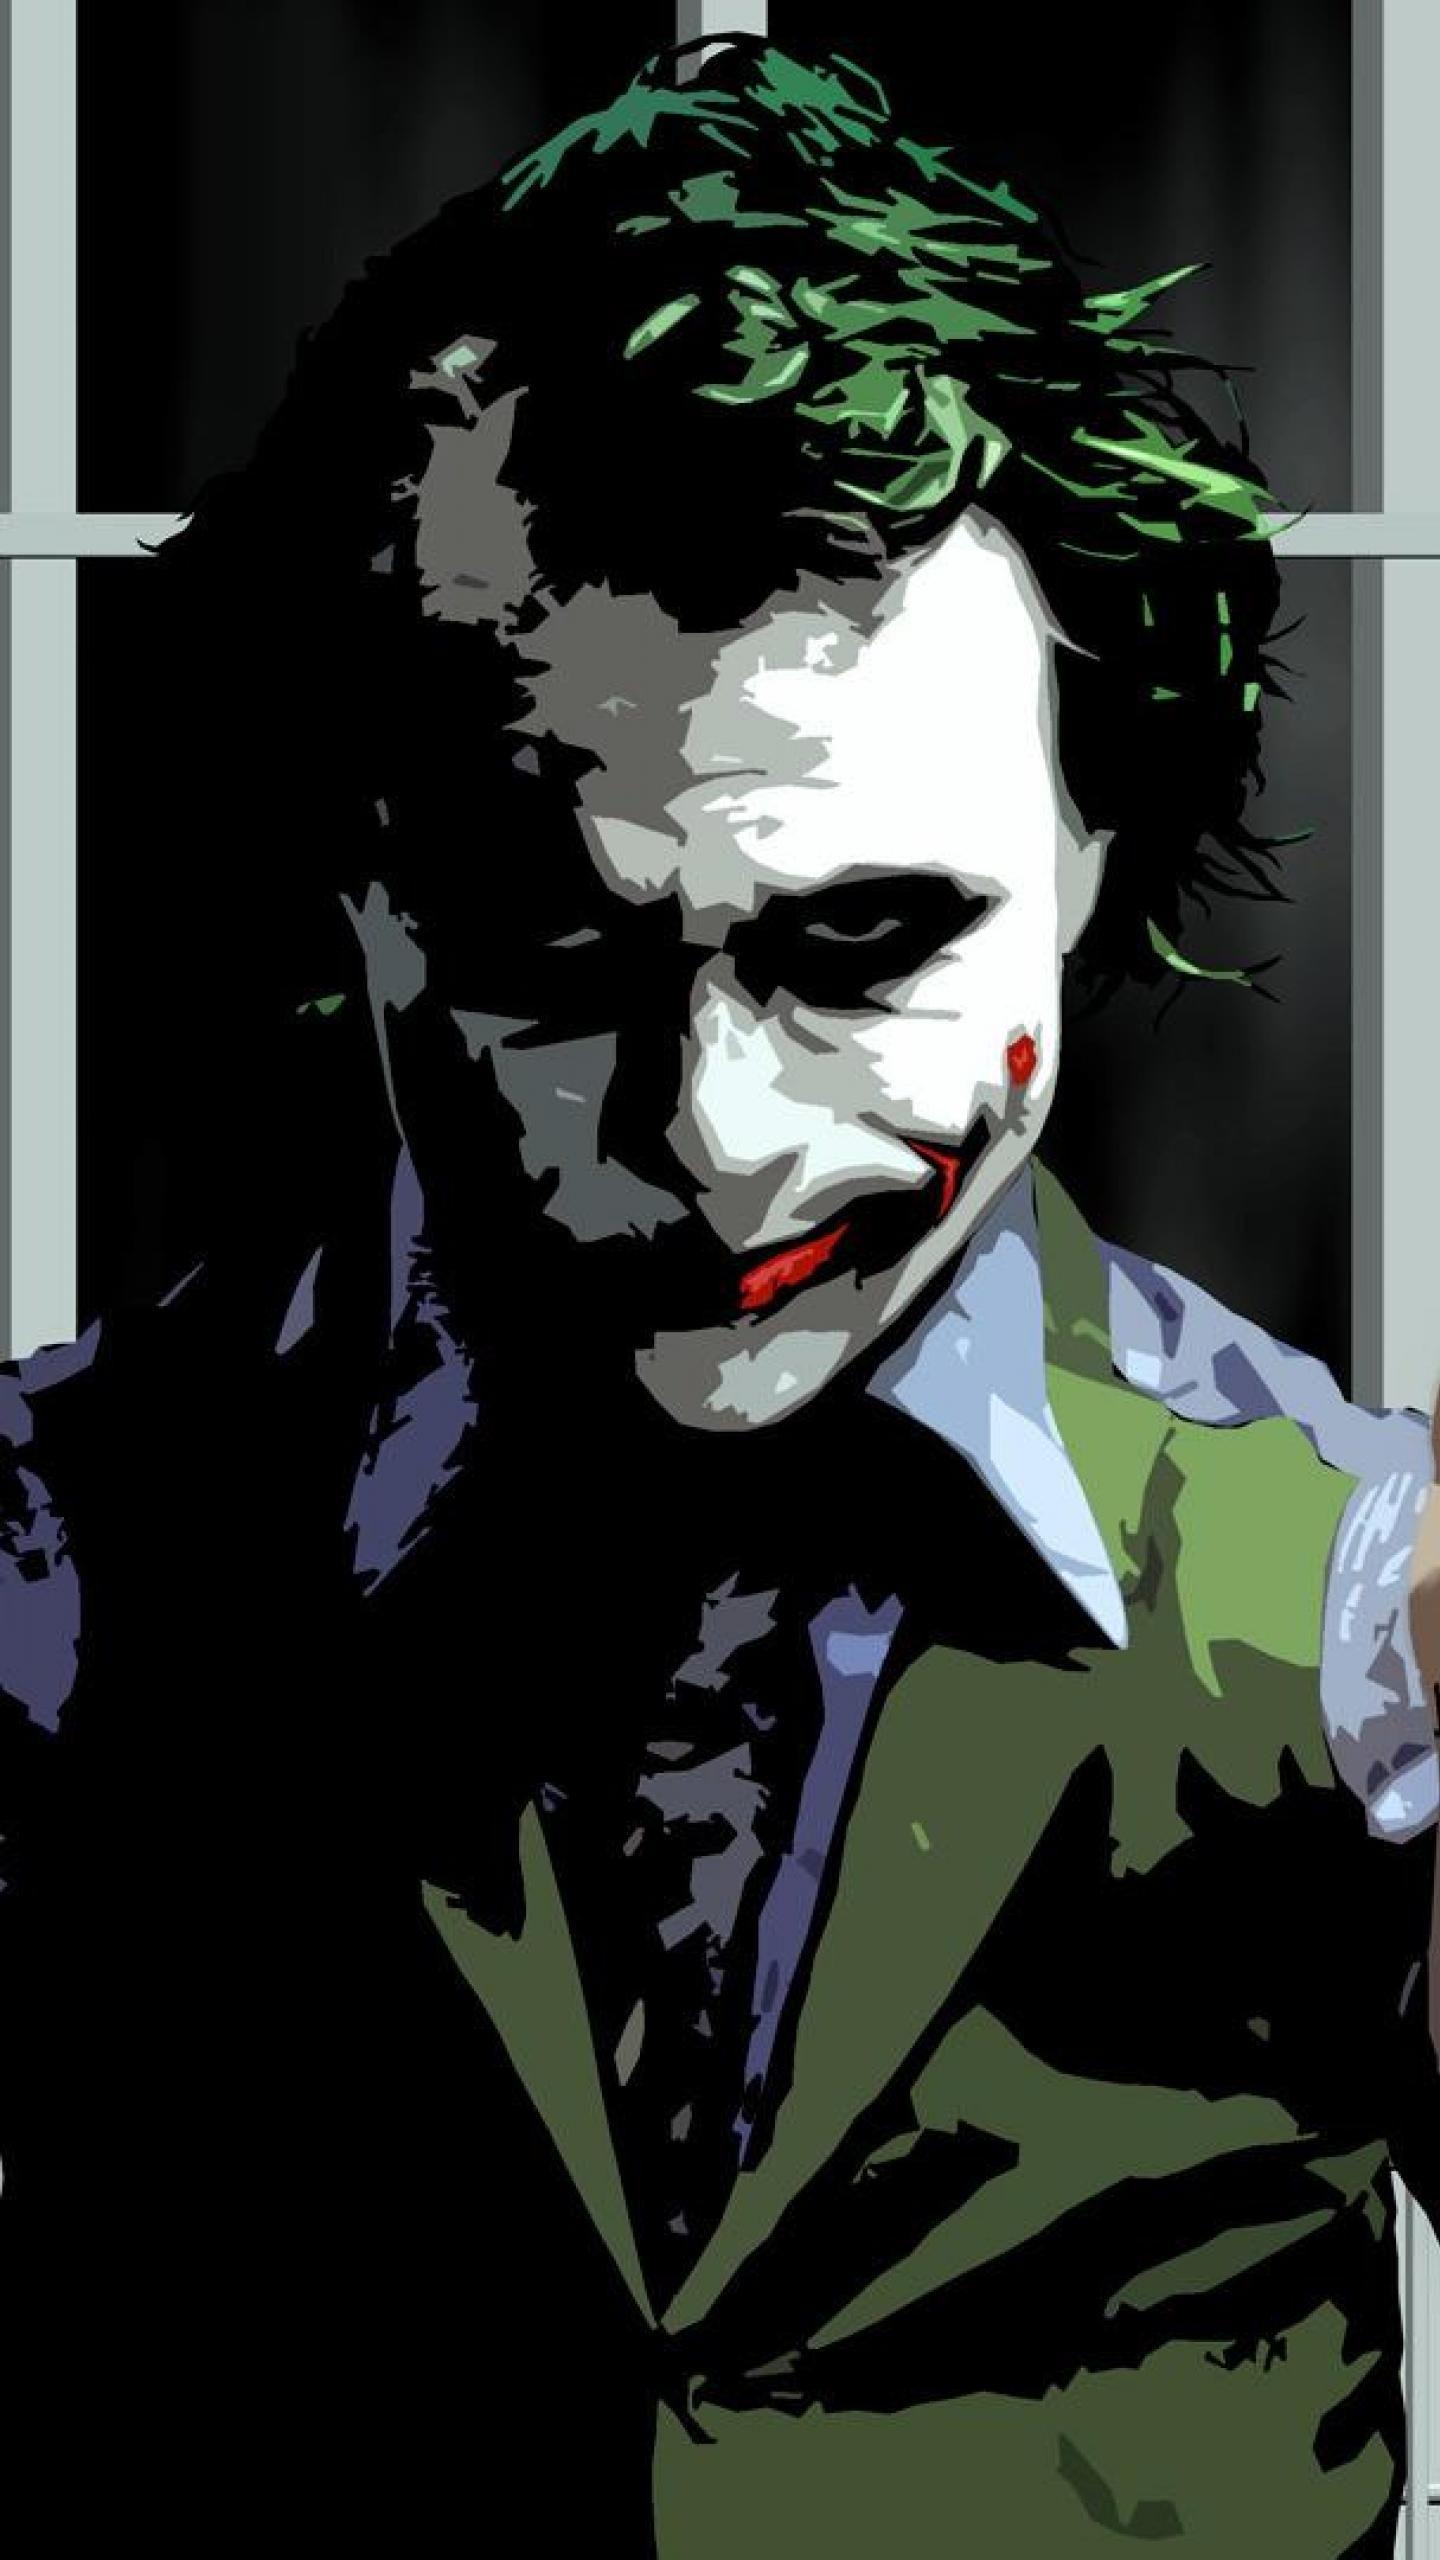 Joker Wallpaper Android mywallpapers site Joker